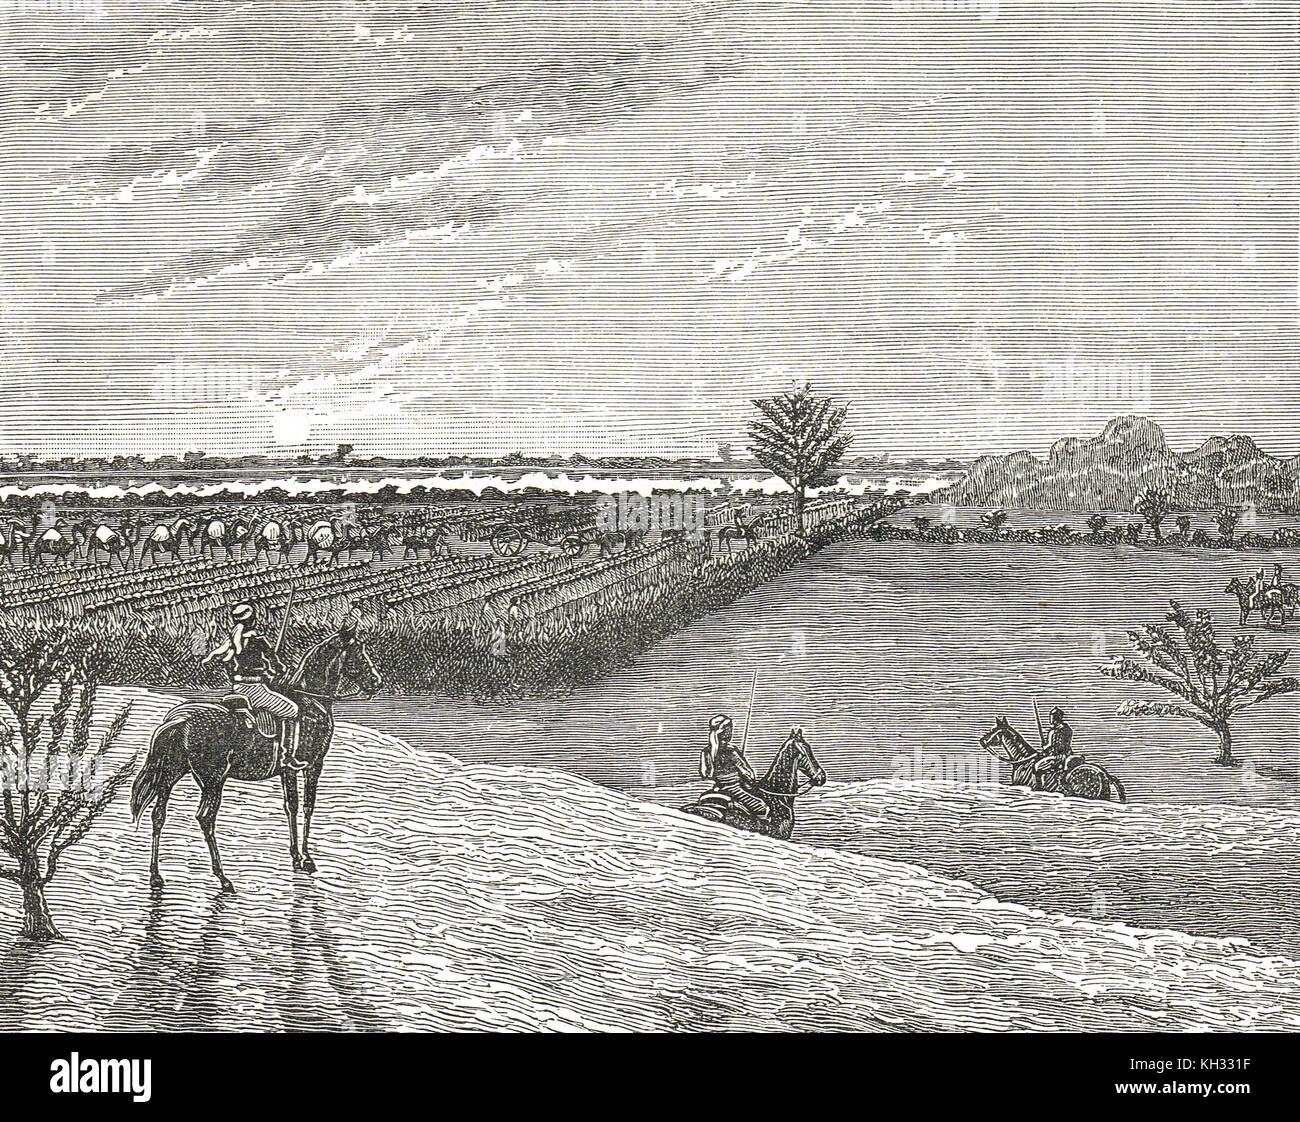 Hicks Pasha expeditionary force to Kordofan, 1883, breaking camp at sunrise - Stock Image